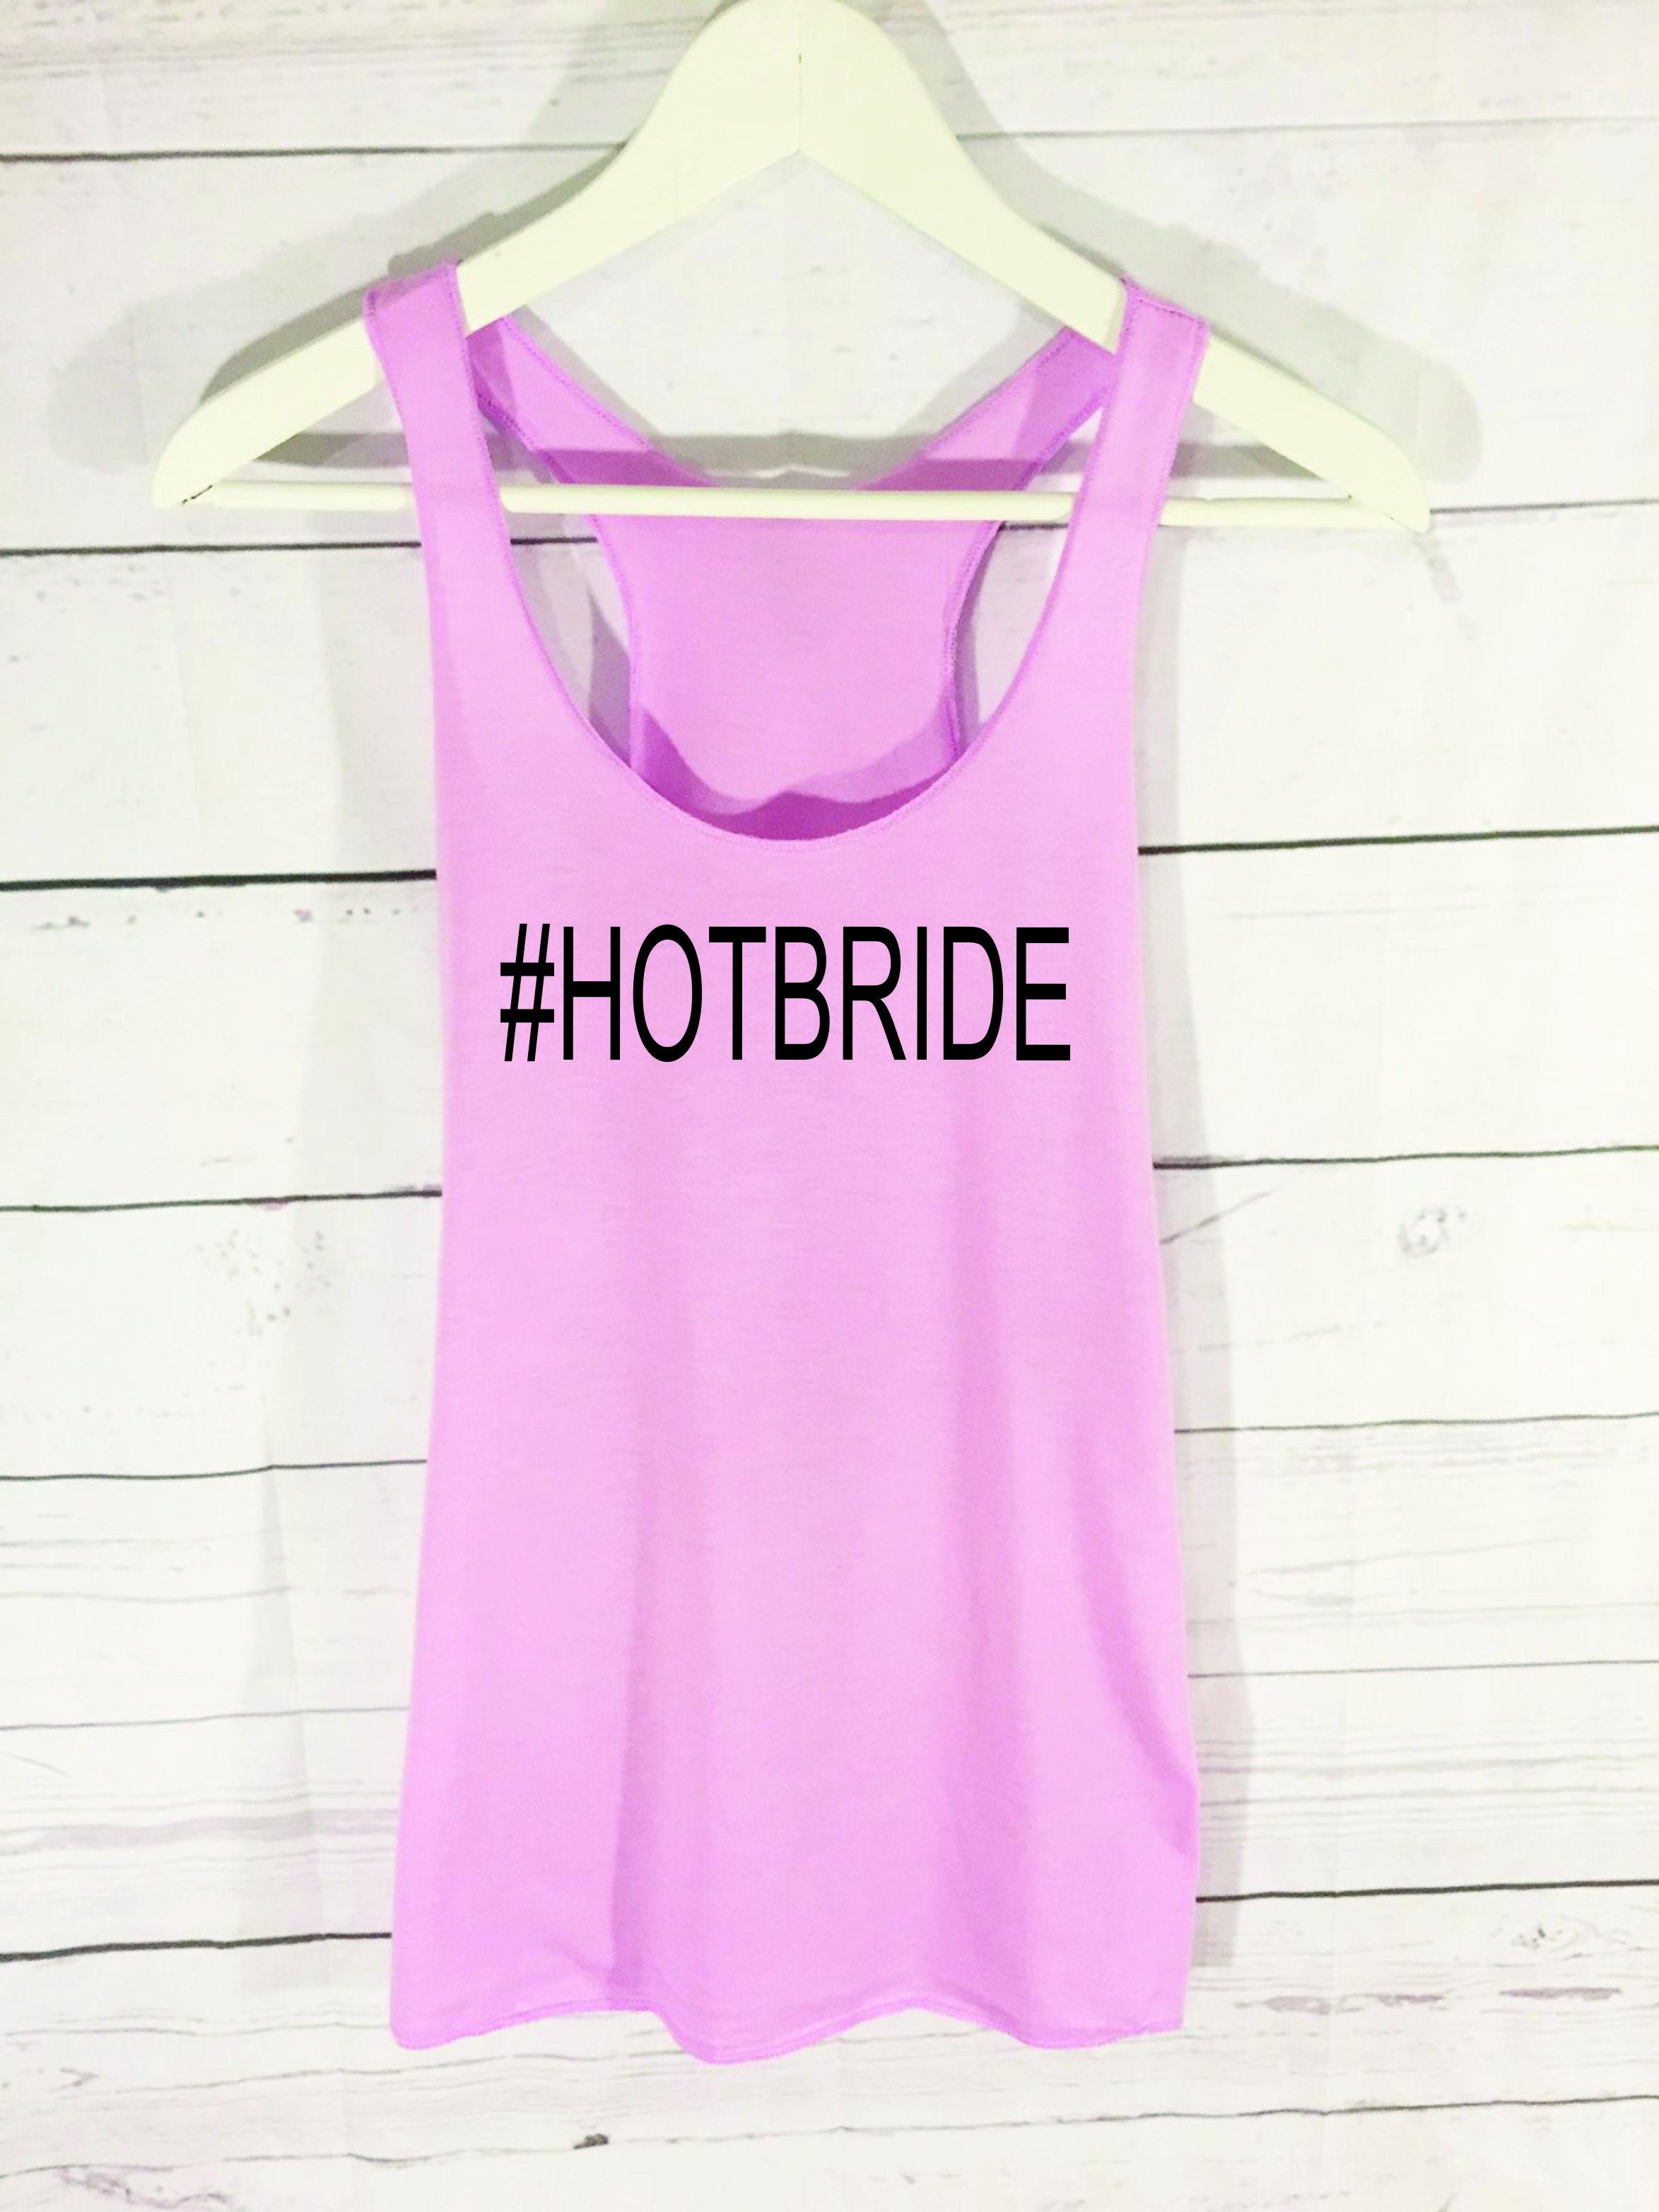 #HOTBRIDE Tee.  www.bacheloretteswag.com  Shirt4ACAUSE